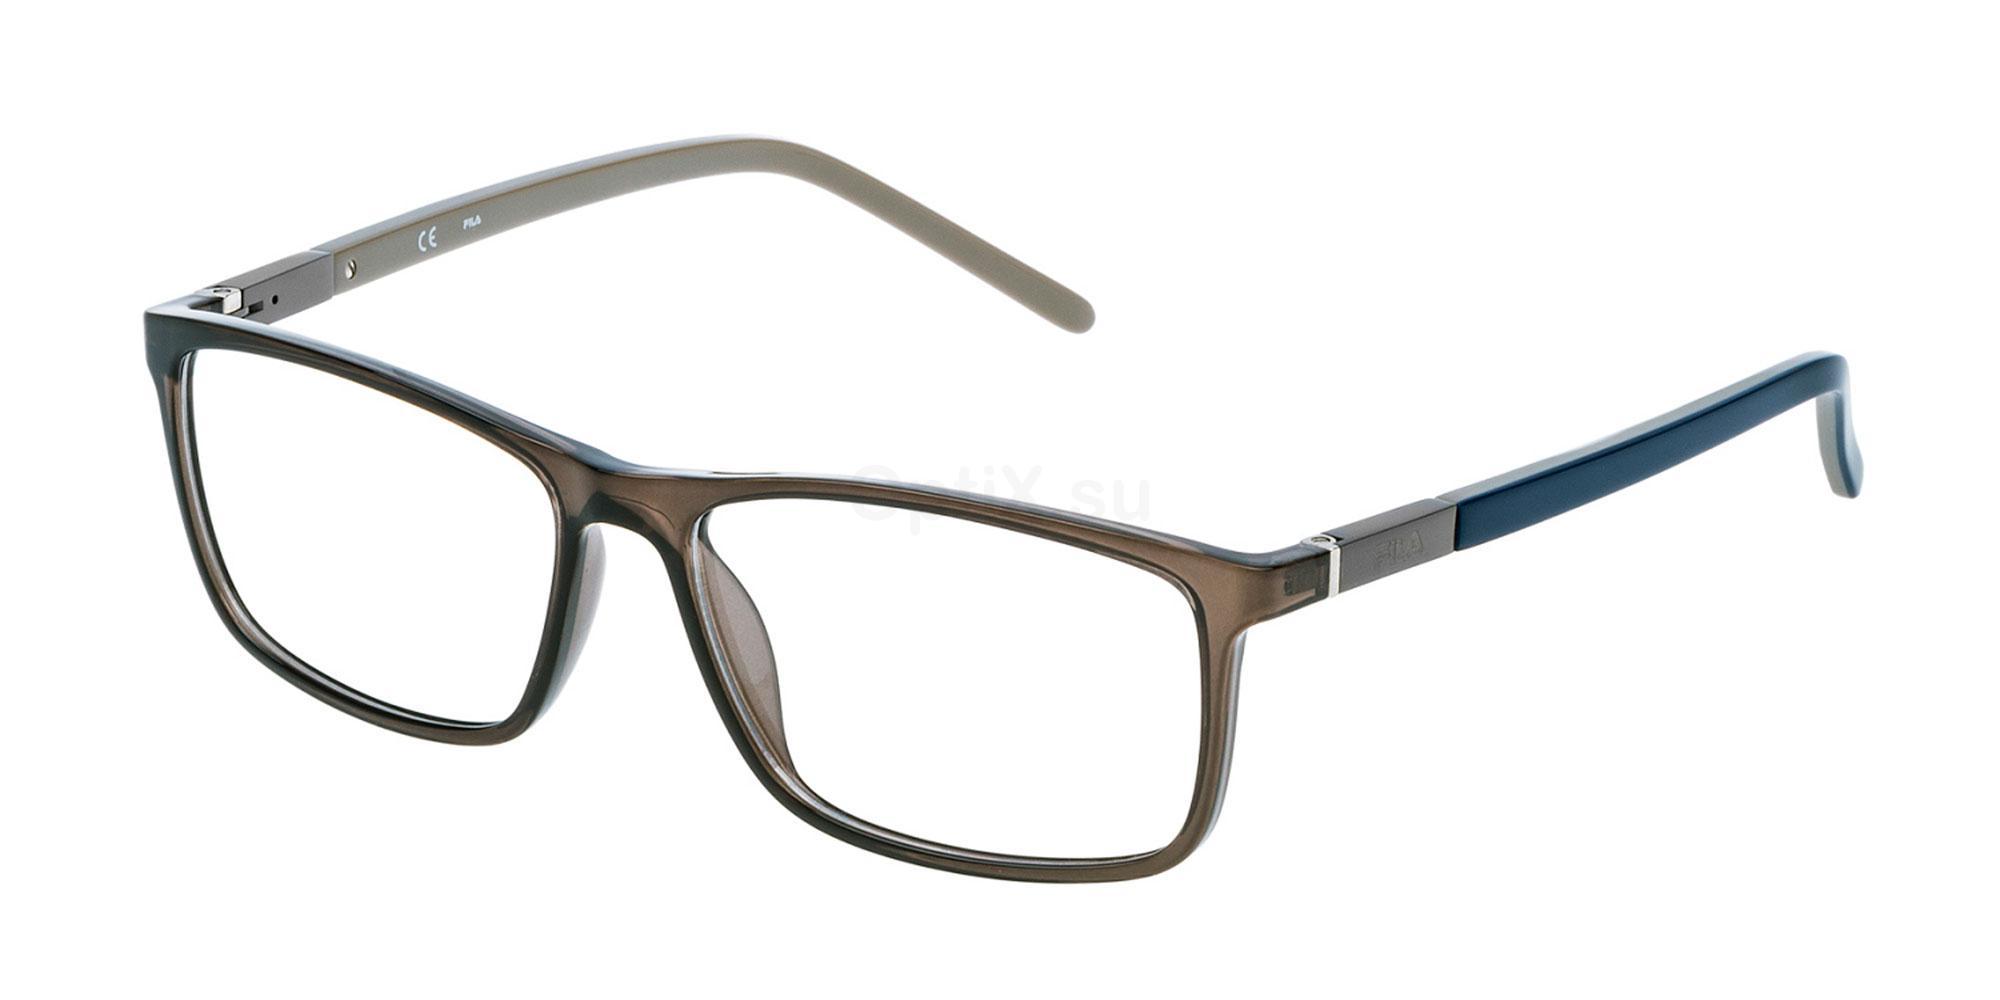 06S8 VF9101 Glasses, Fila